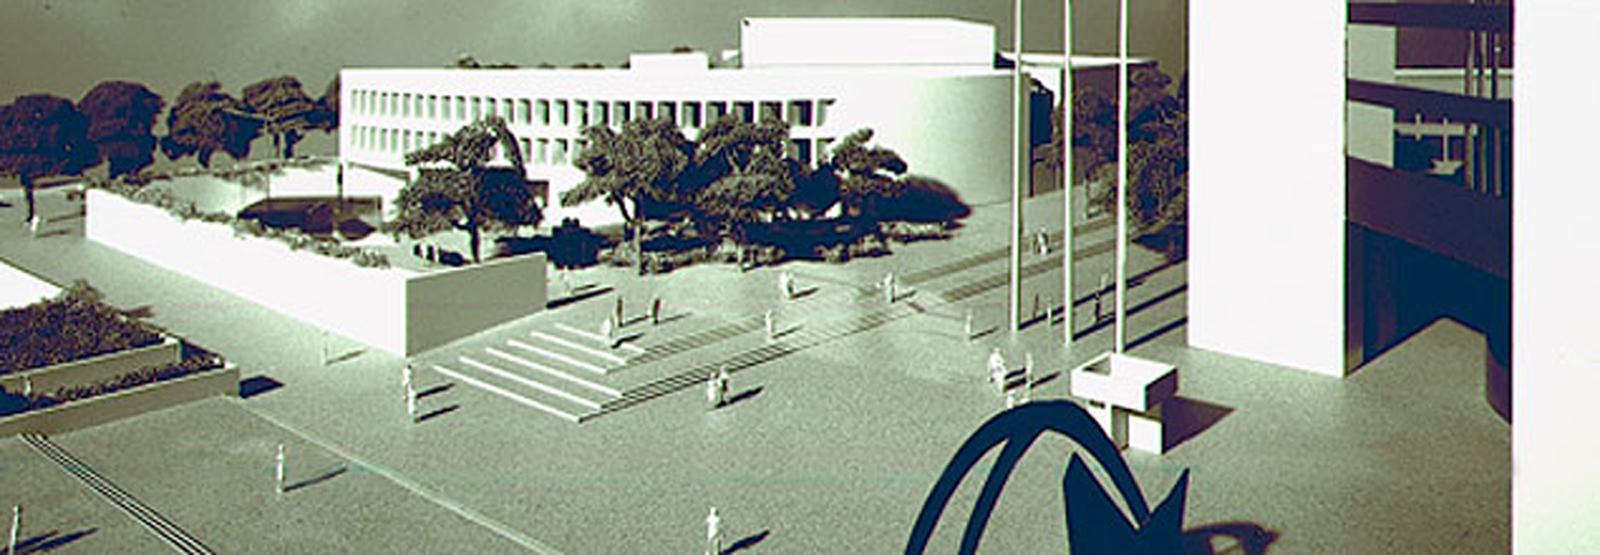 LongBeachCivicCenter-Mullio-Cara-Jennifer-Volland-Long-Beach-Architecture-The-Unexpected-Metropolis-2004-banner-1600.jpg